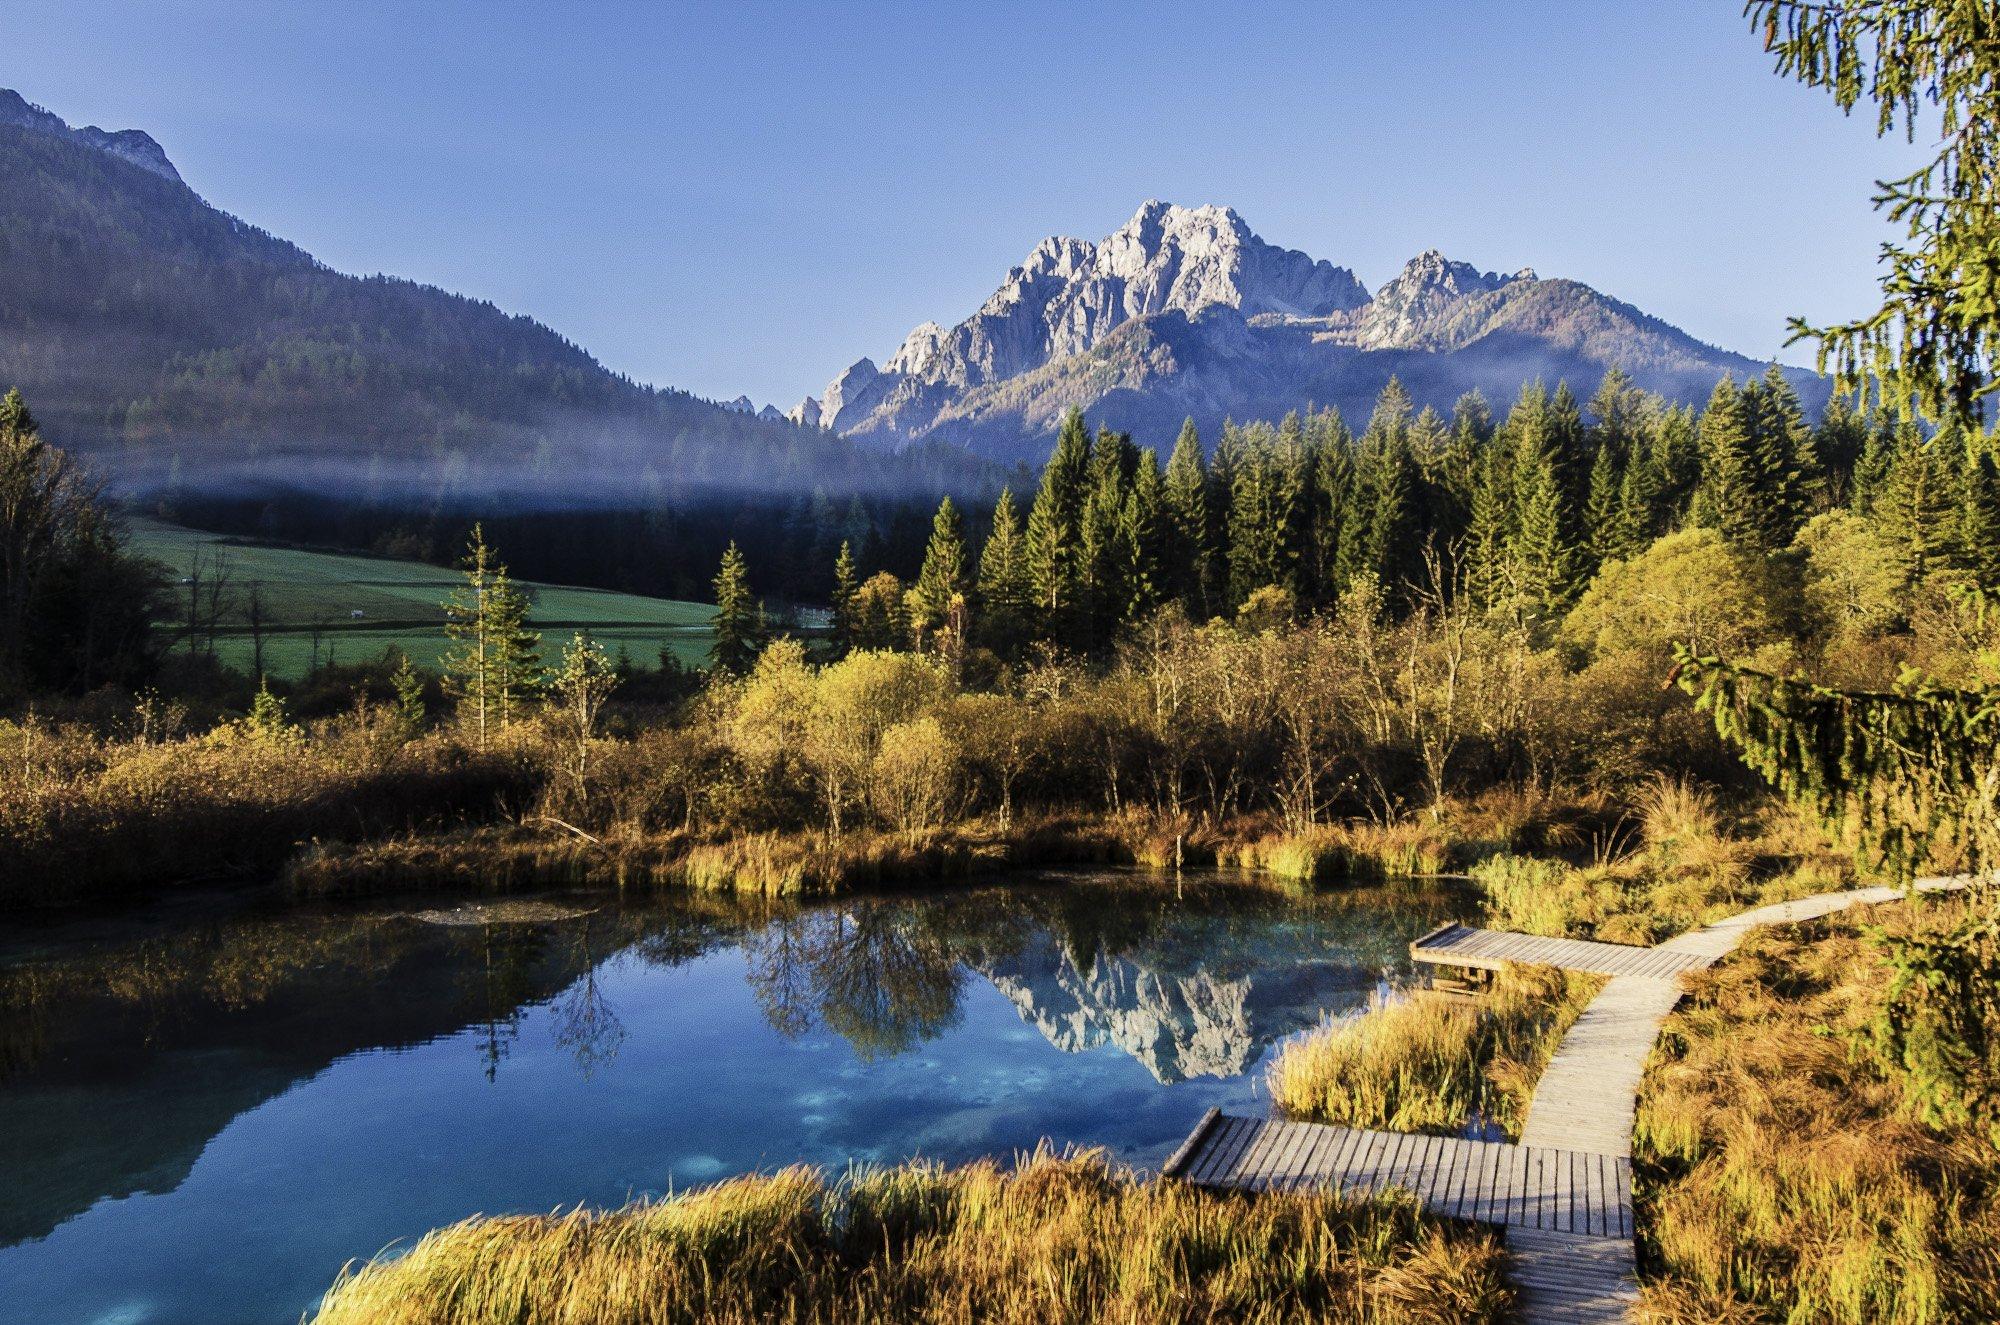 elope to slovenian mountains